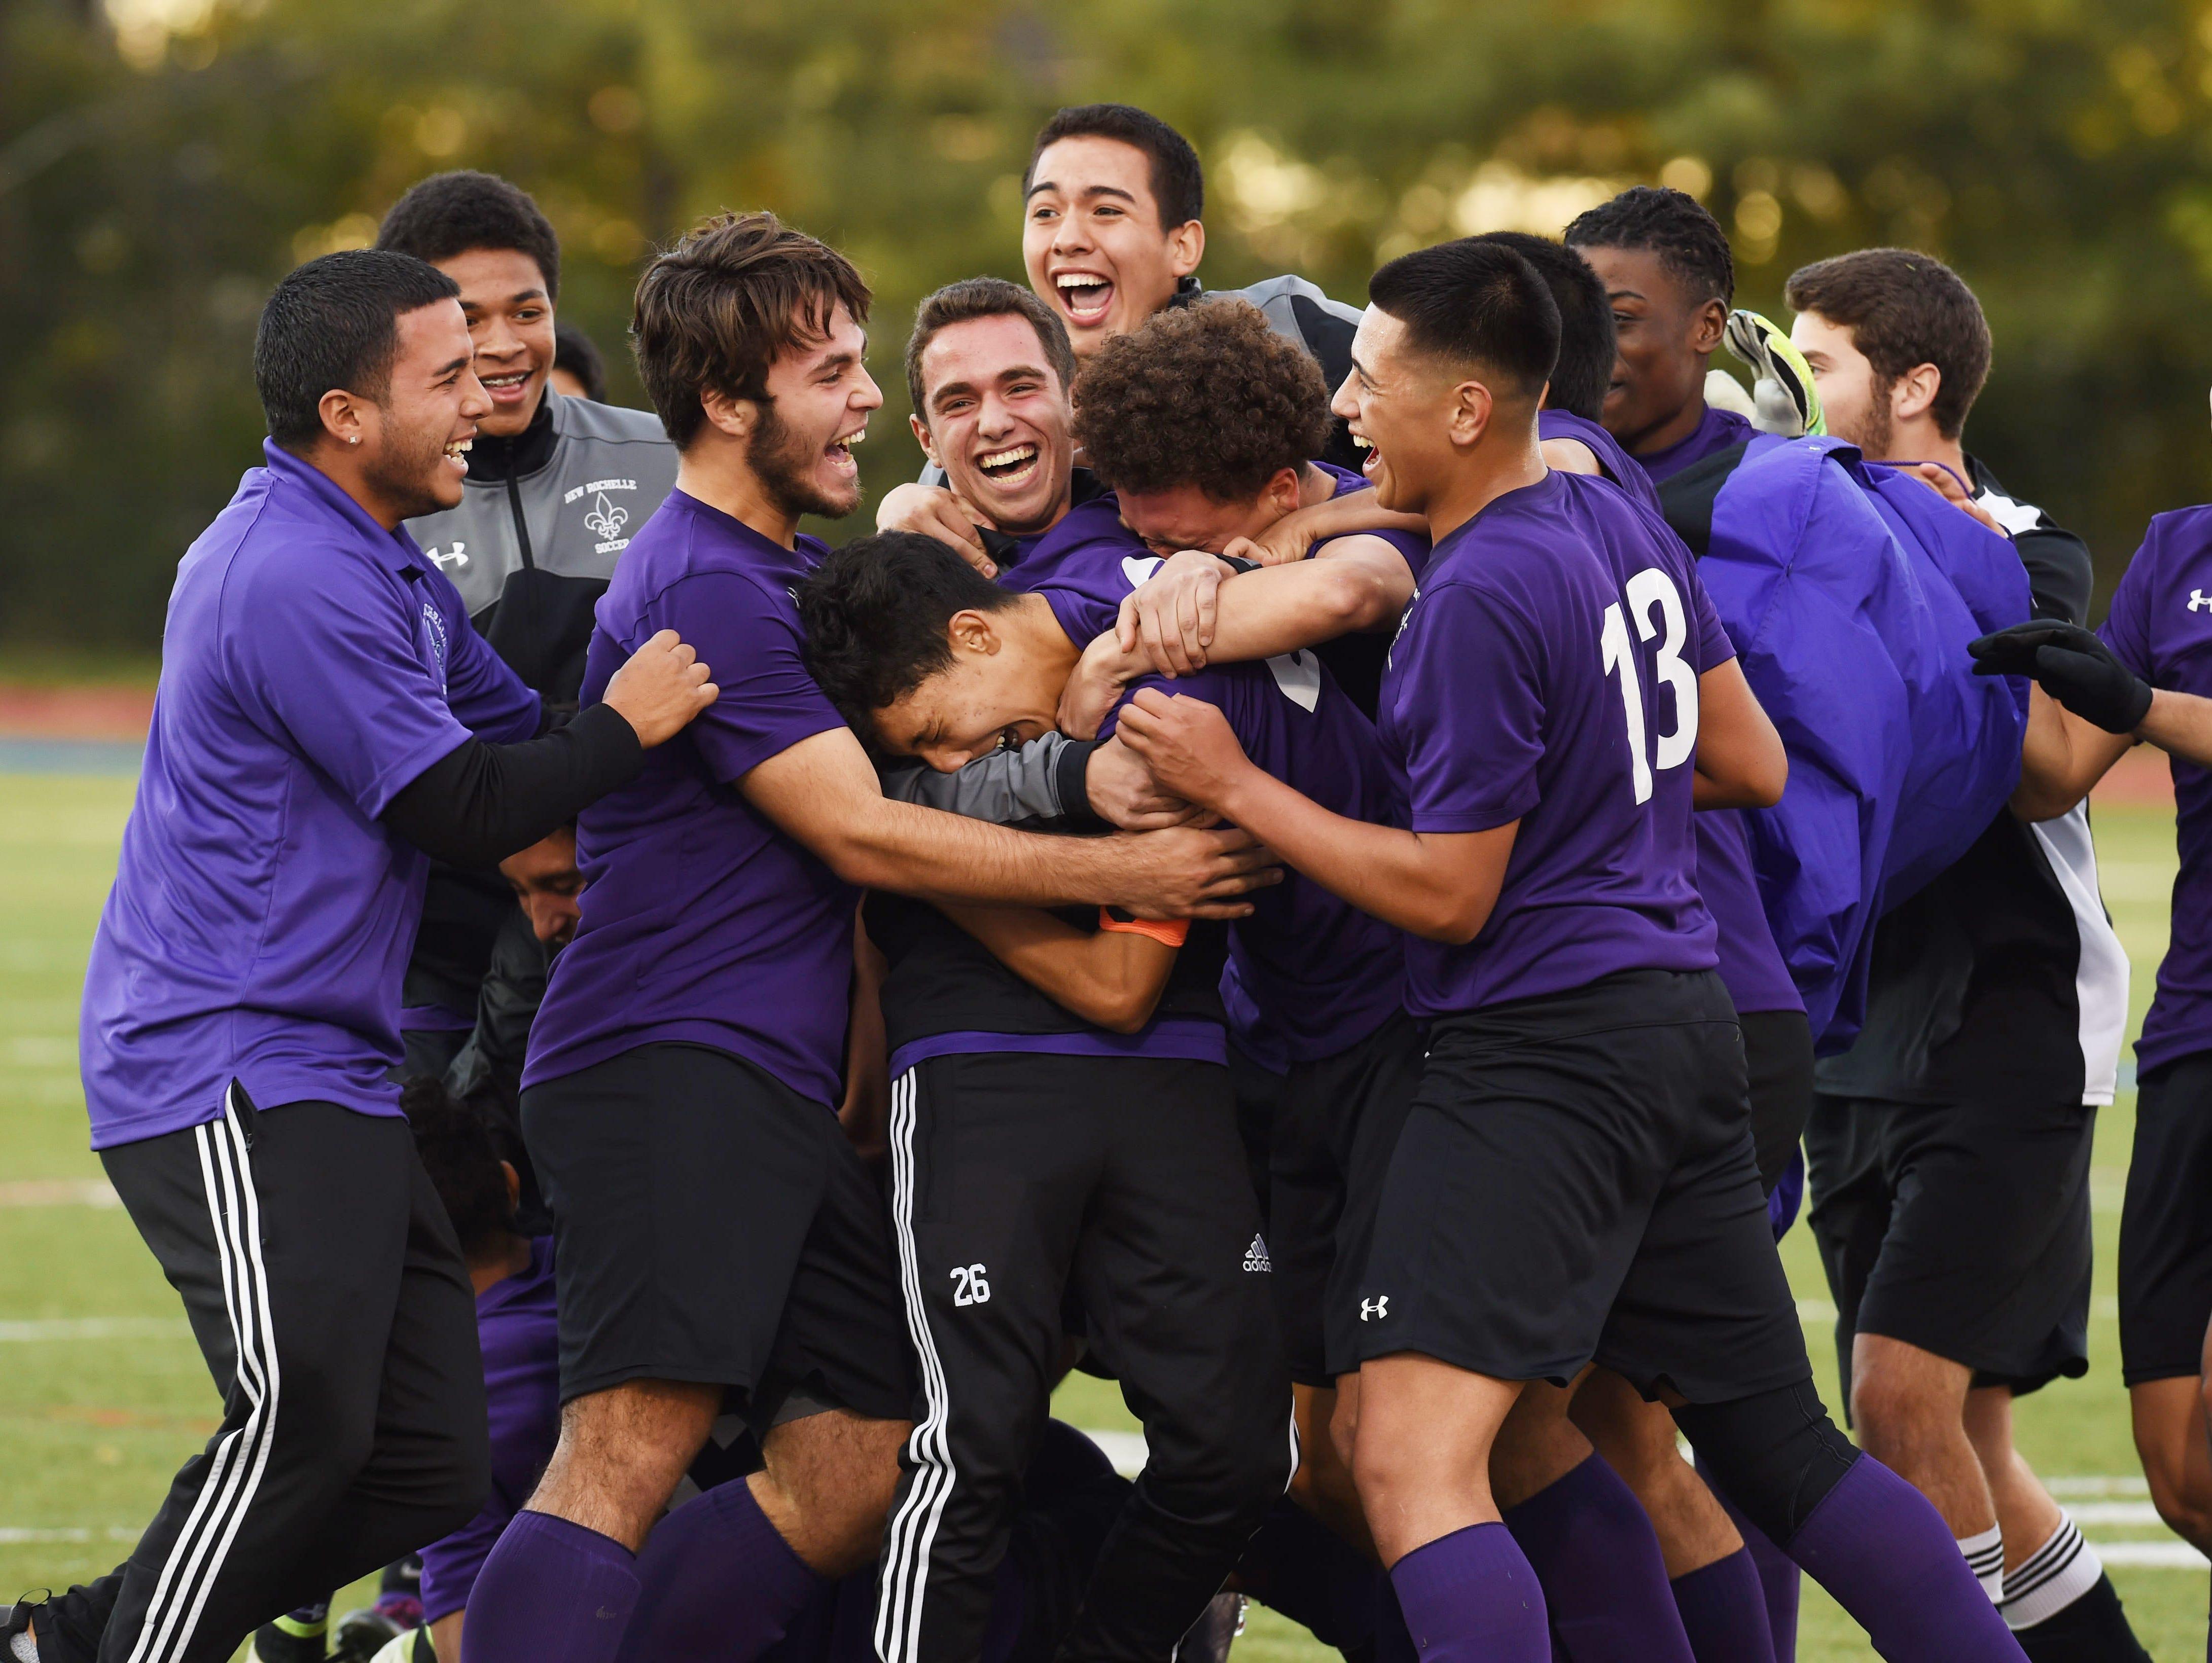 New Rochelle's boys soccer team celebrates after winning Saturday's Class AA regional final against Newburgh.